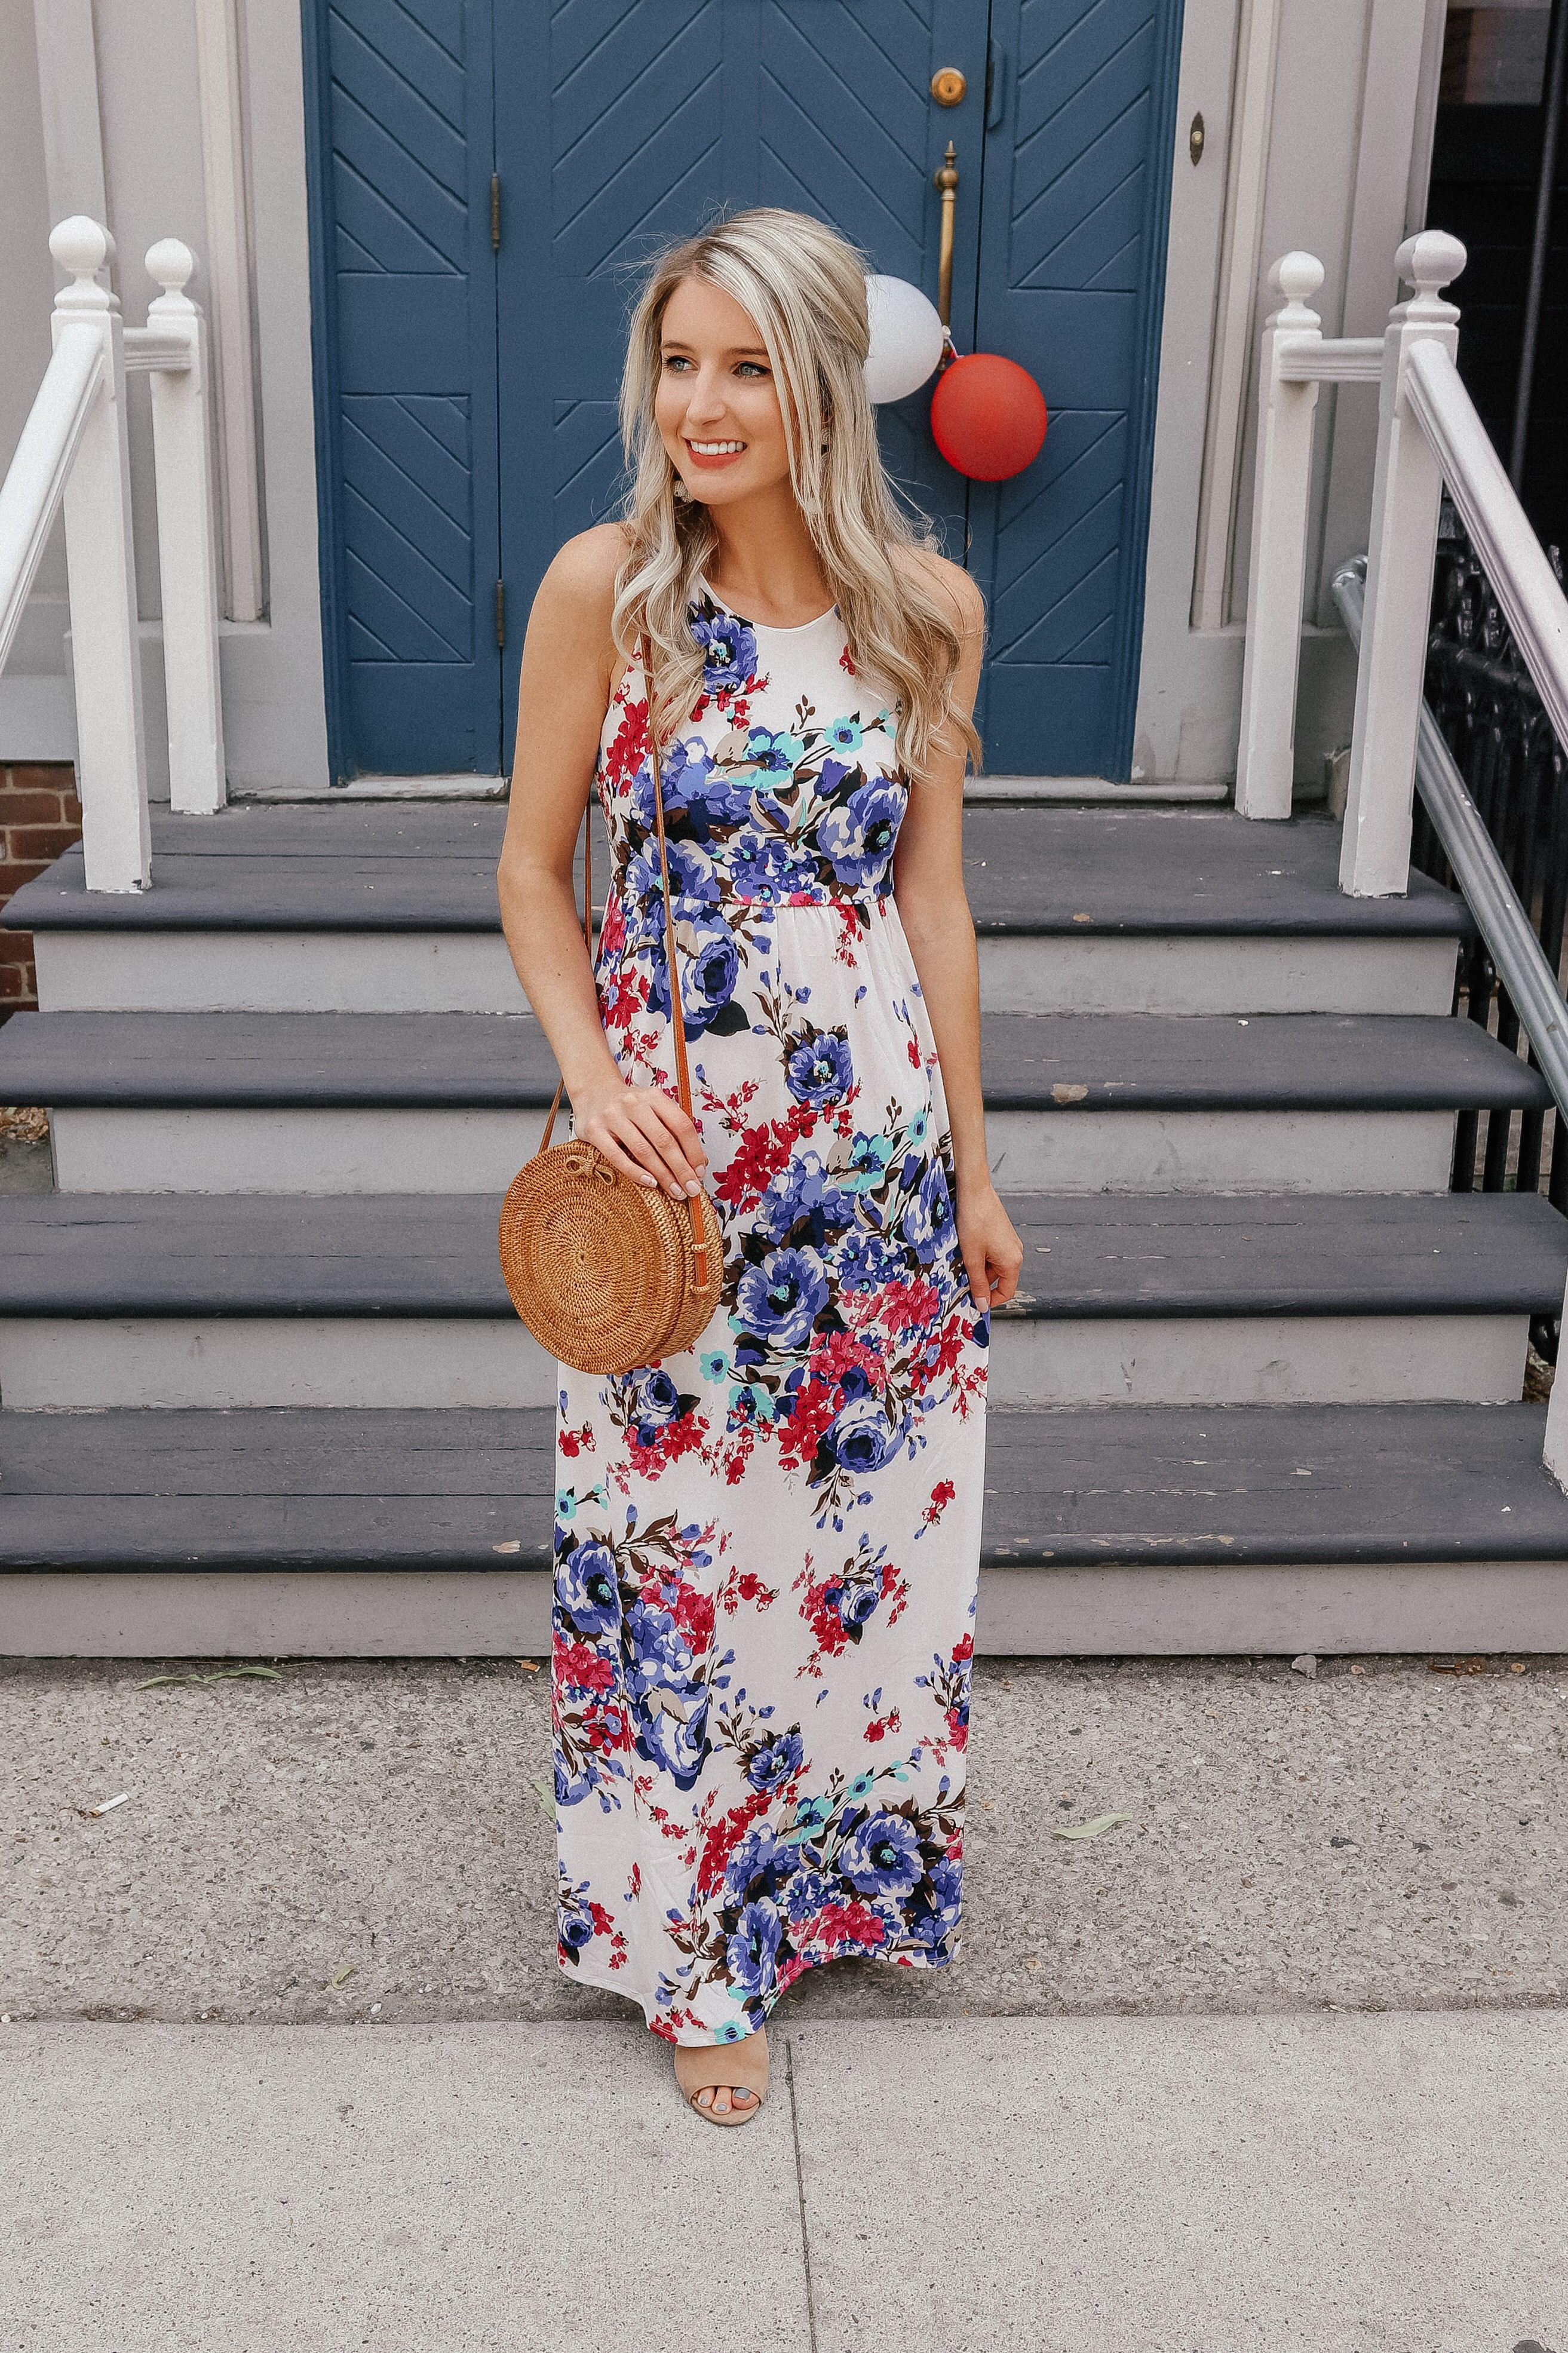 Christine Maxi Dress Mysite Summer Maxi Dress Floral Summer Maxi Dress Maxi Dress [ 3939 x 2625 Pixel ]